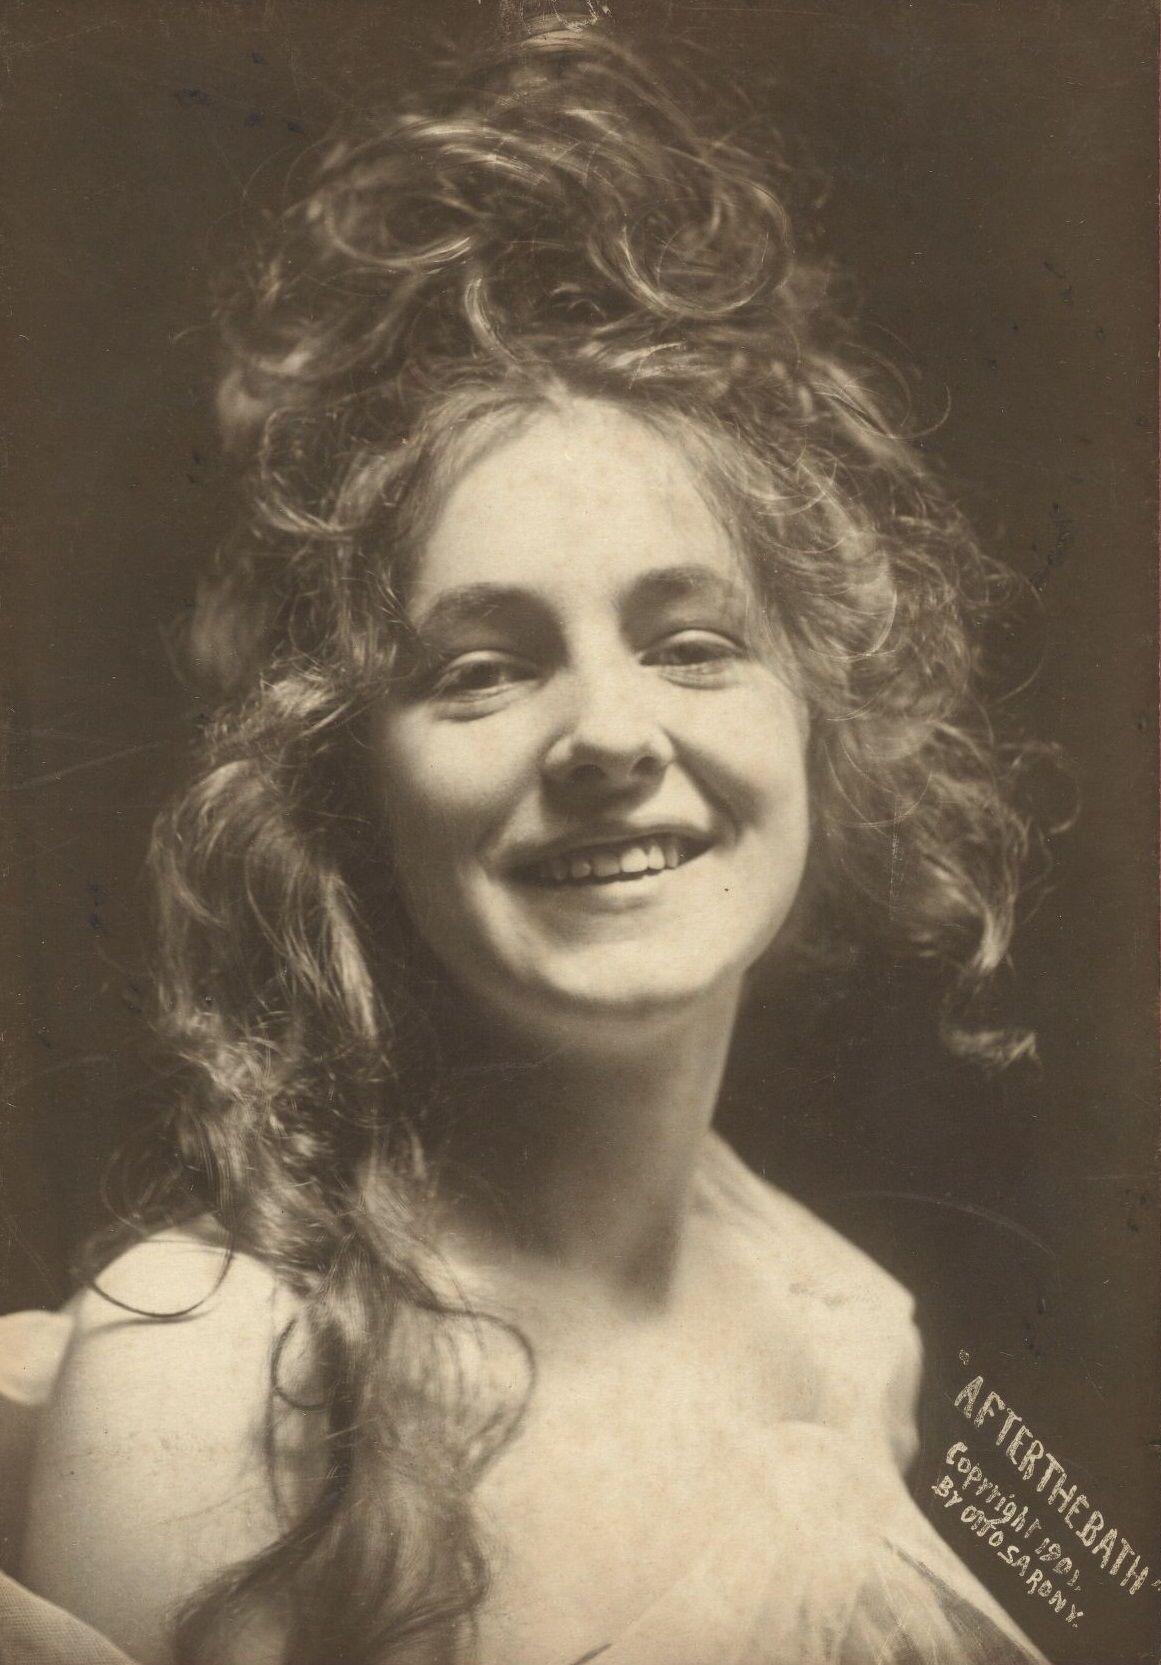 Billie Frechette - Actress, Theater Actress, Singer, Criminal - Biography Photo of evelyn frechette